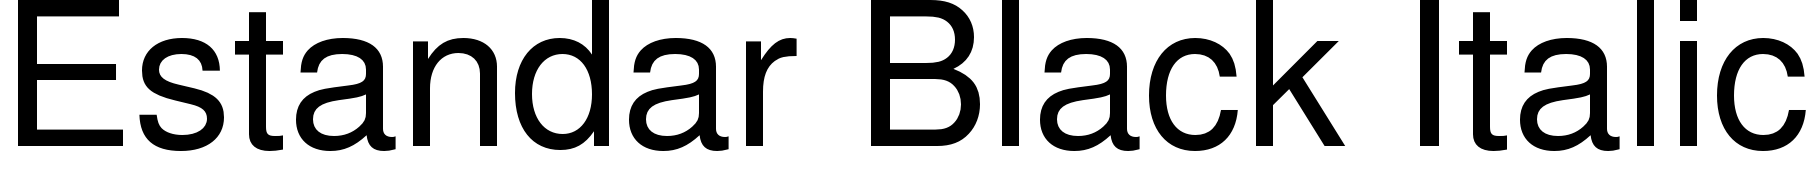 Estandar Black Italic